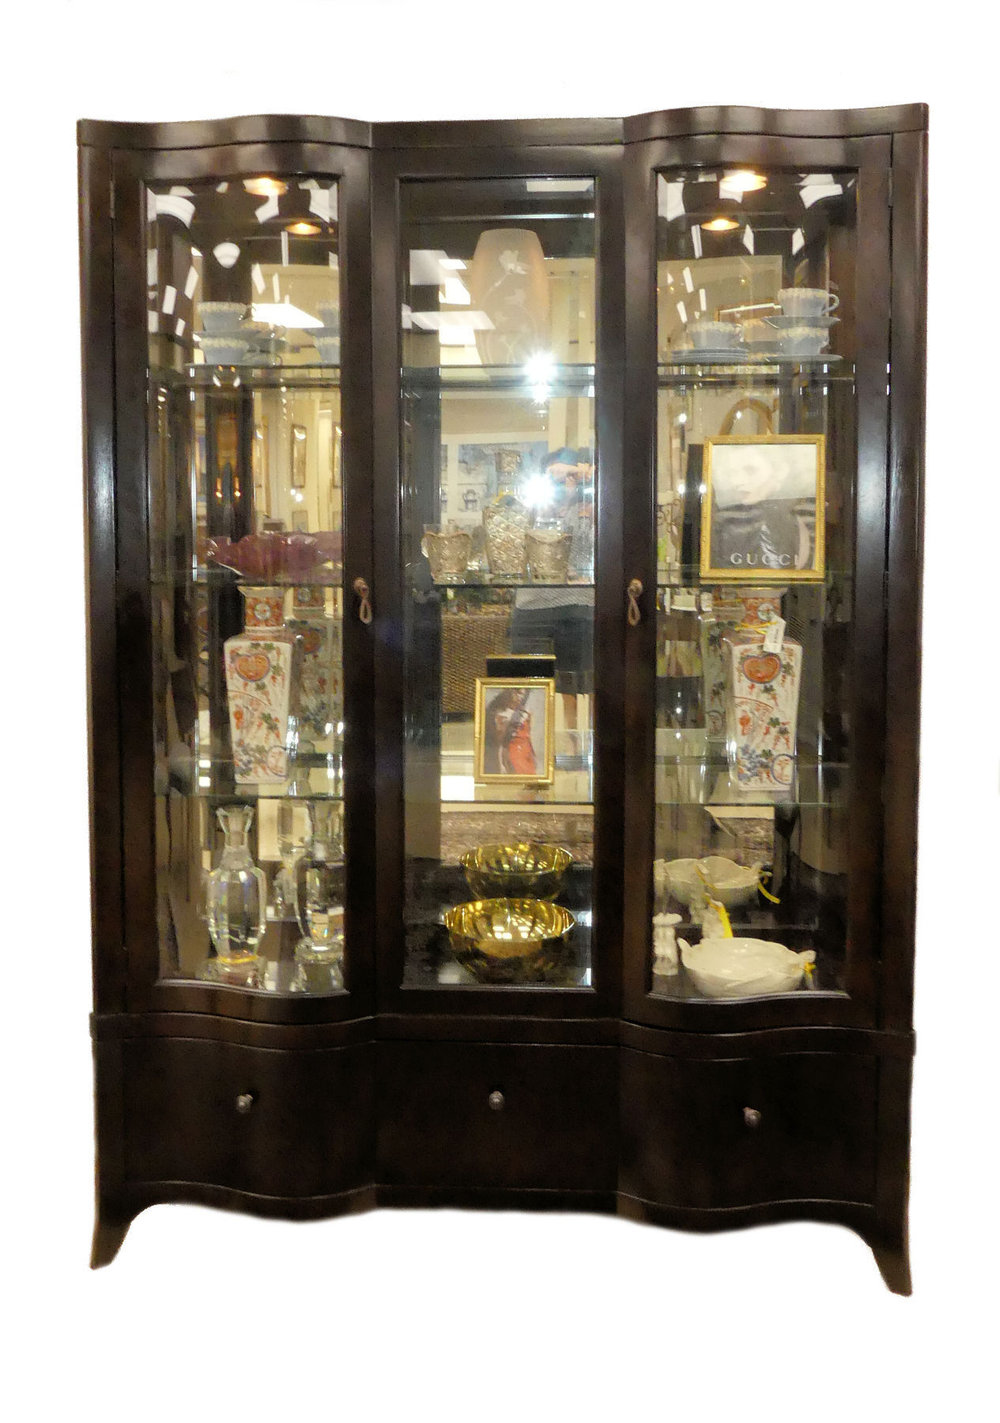 Contemporary Serpentine Dark Wood China Cabinet  $950